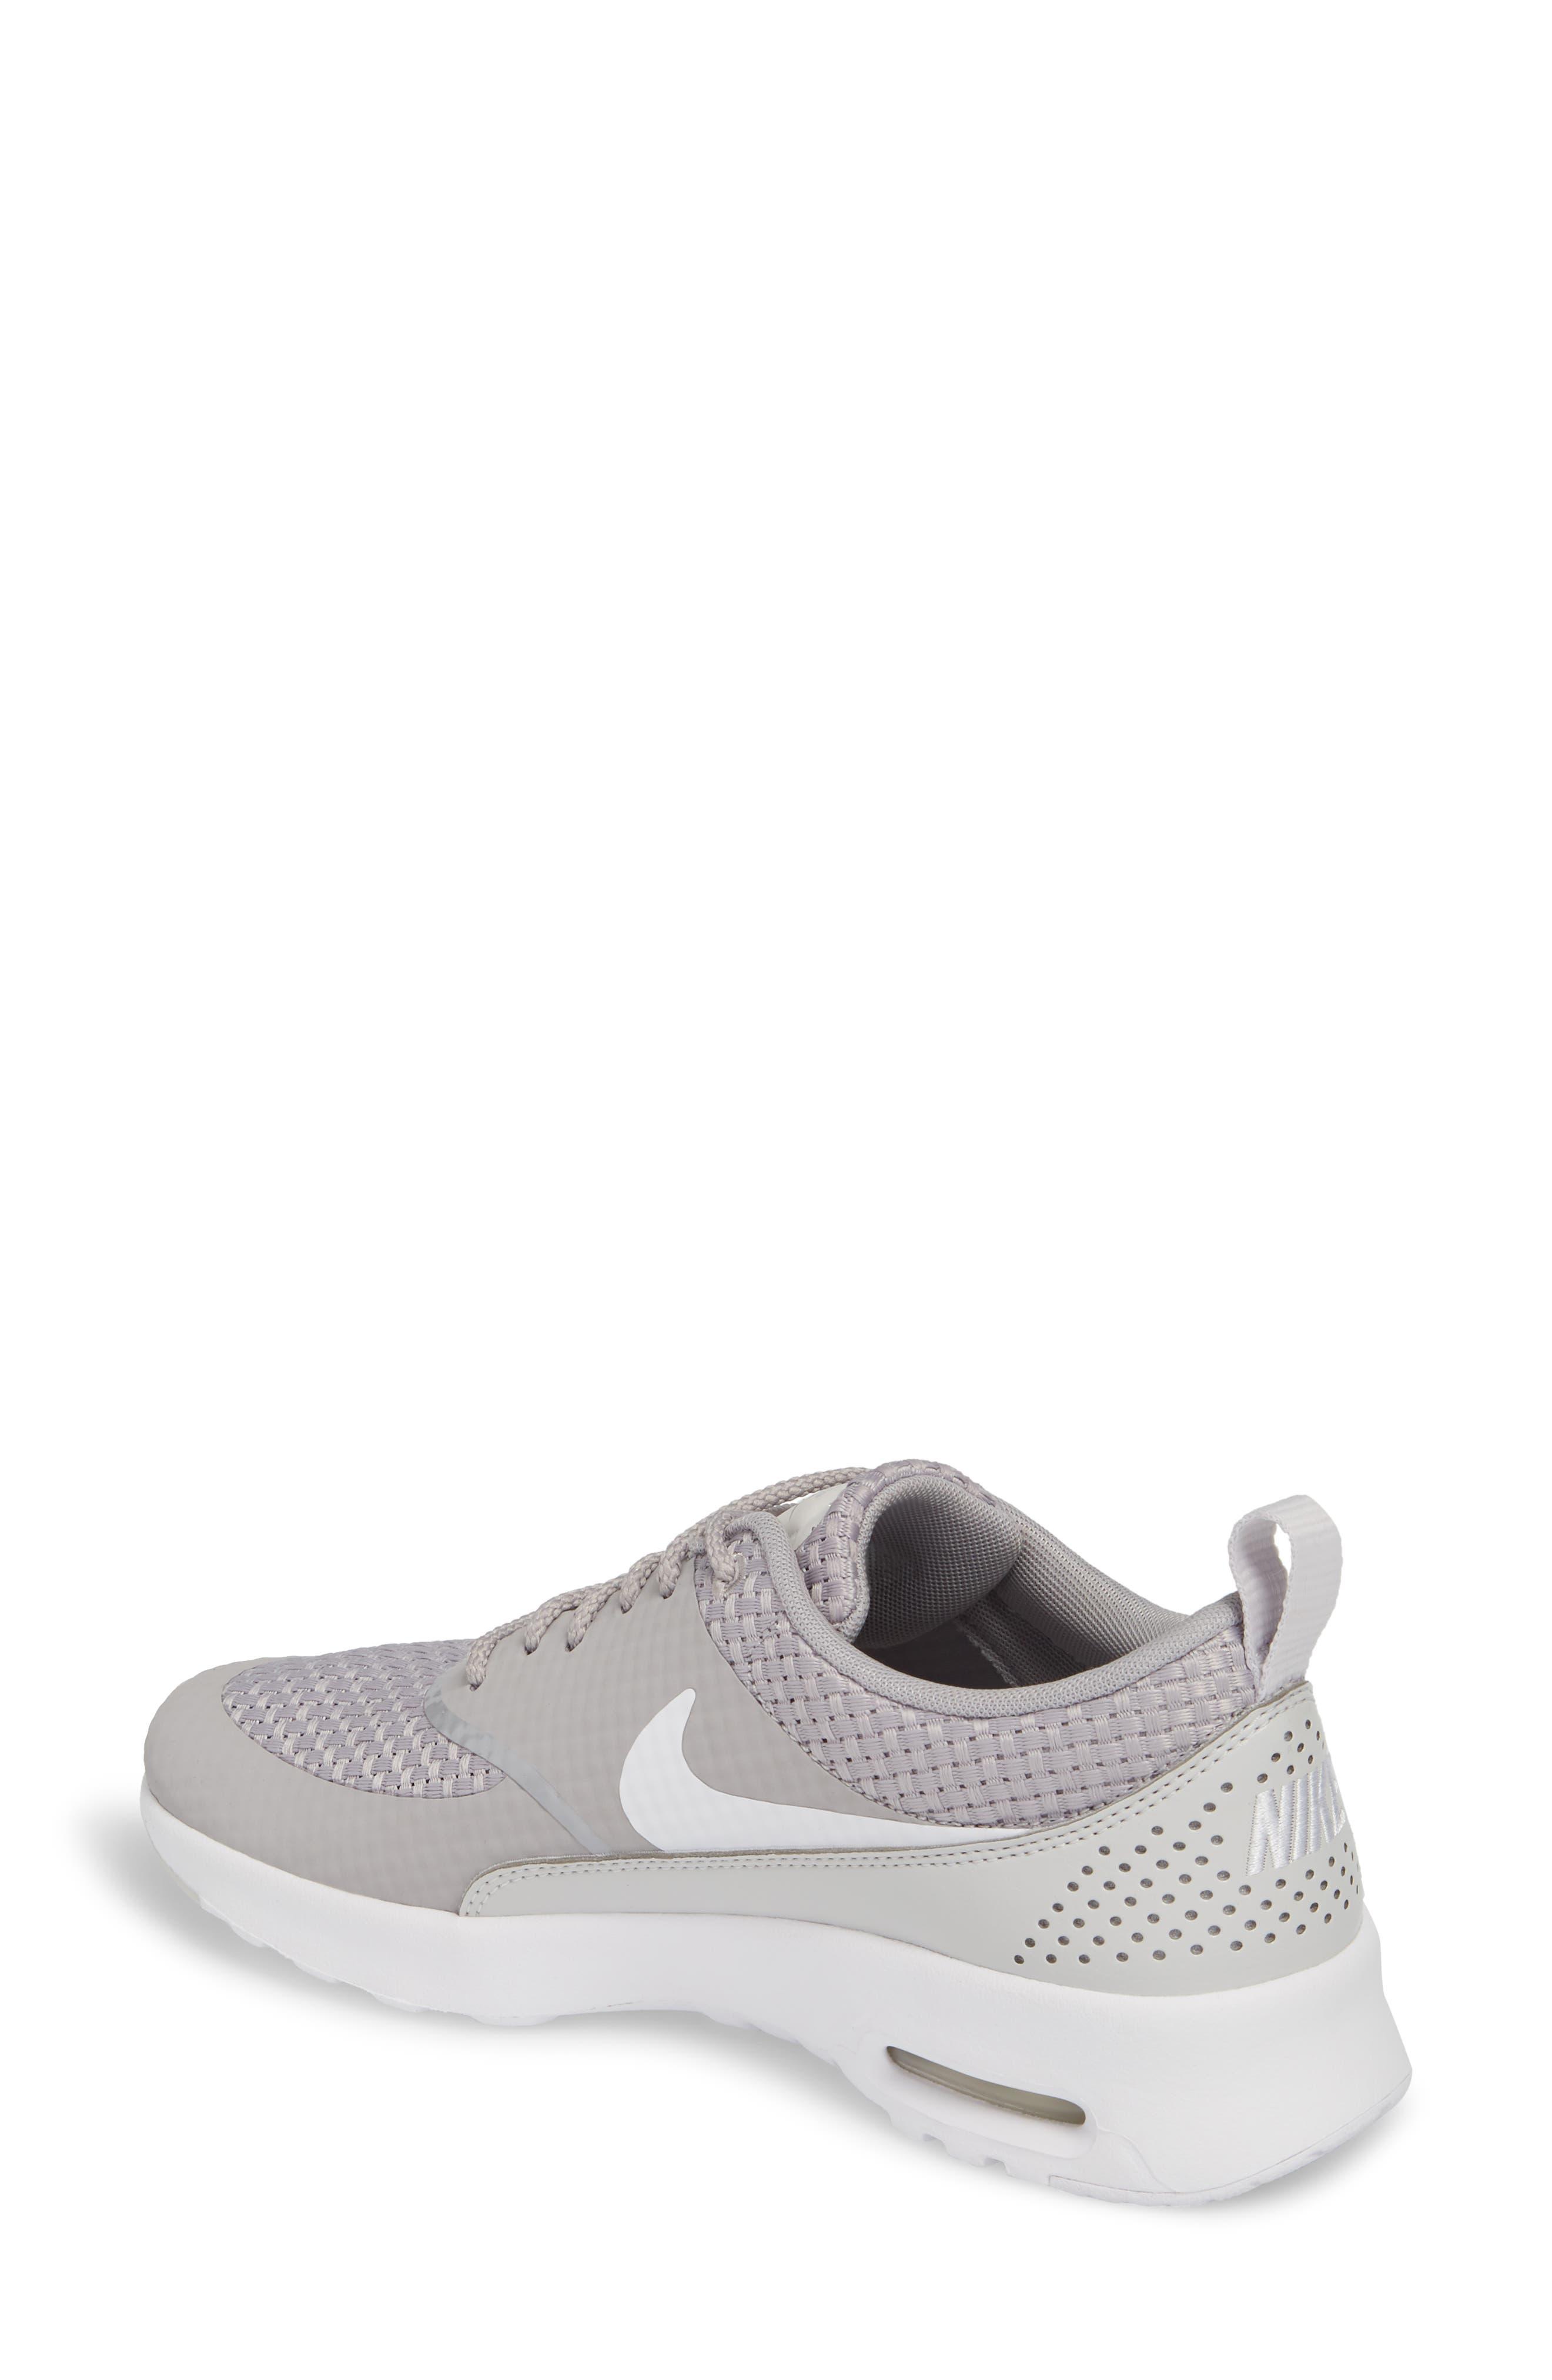 Air Max Thea Sneaker,                             Alternate thumbnail 2, color,                             ATMOSPHERE GREY/ WHITE